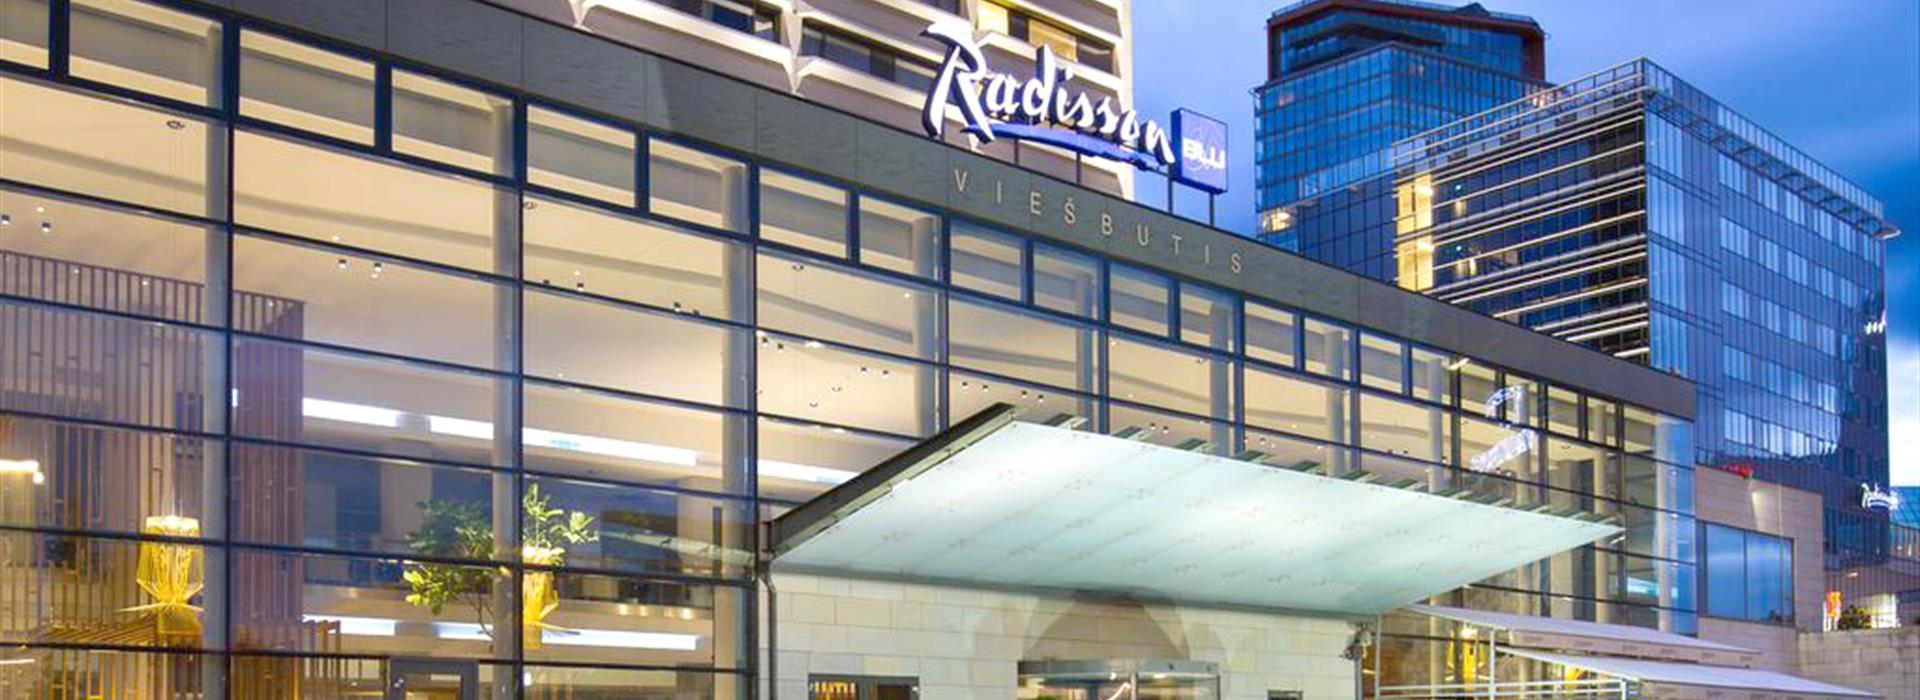 Radisson-Blu-hotel-Latvija